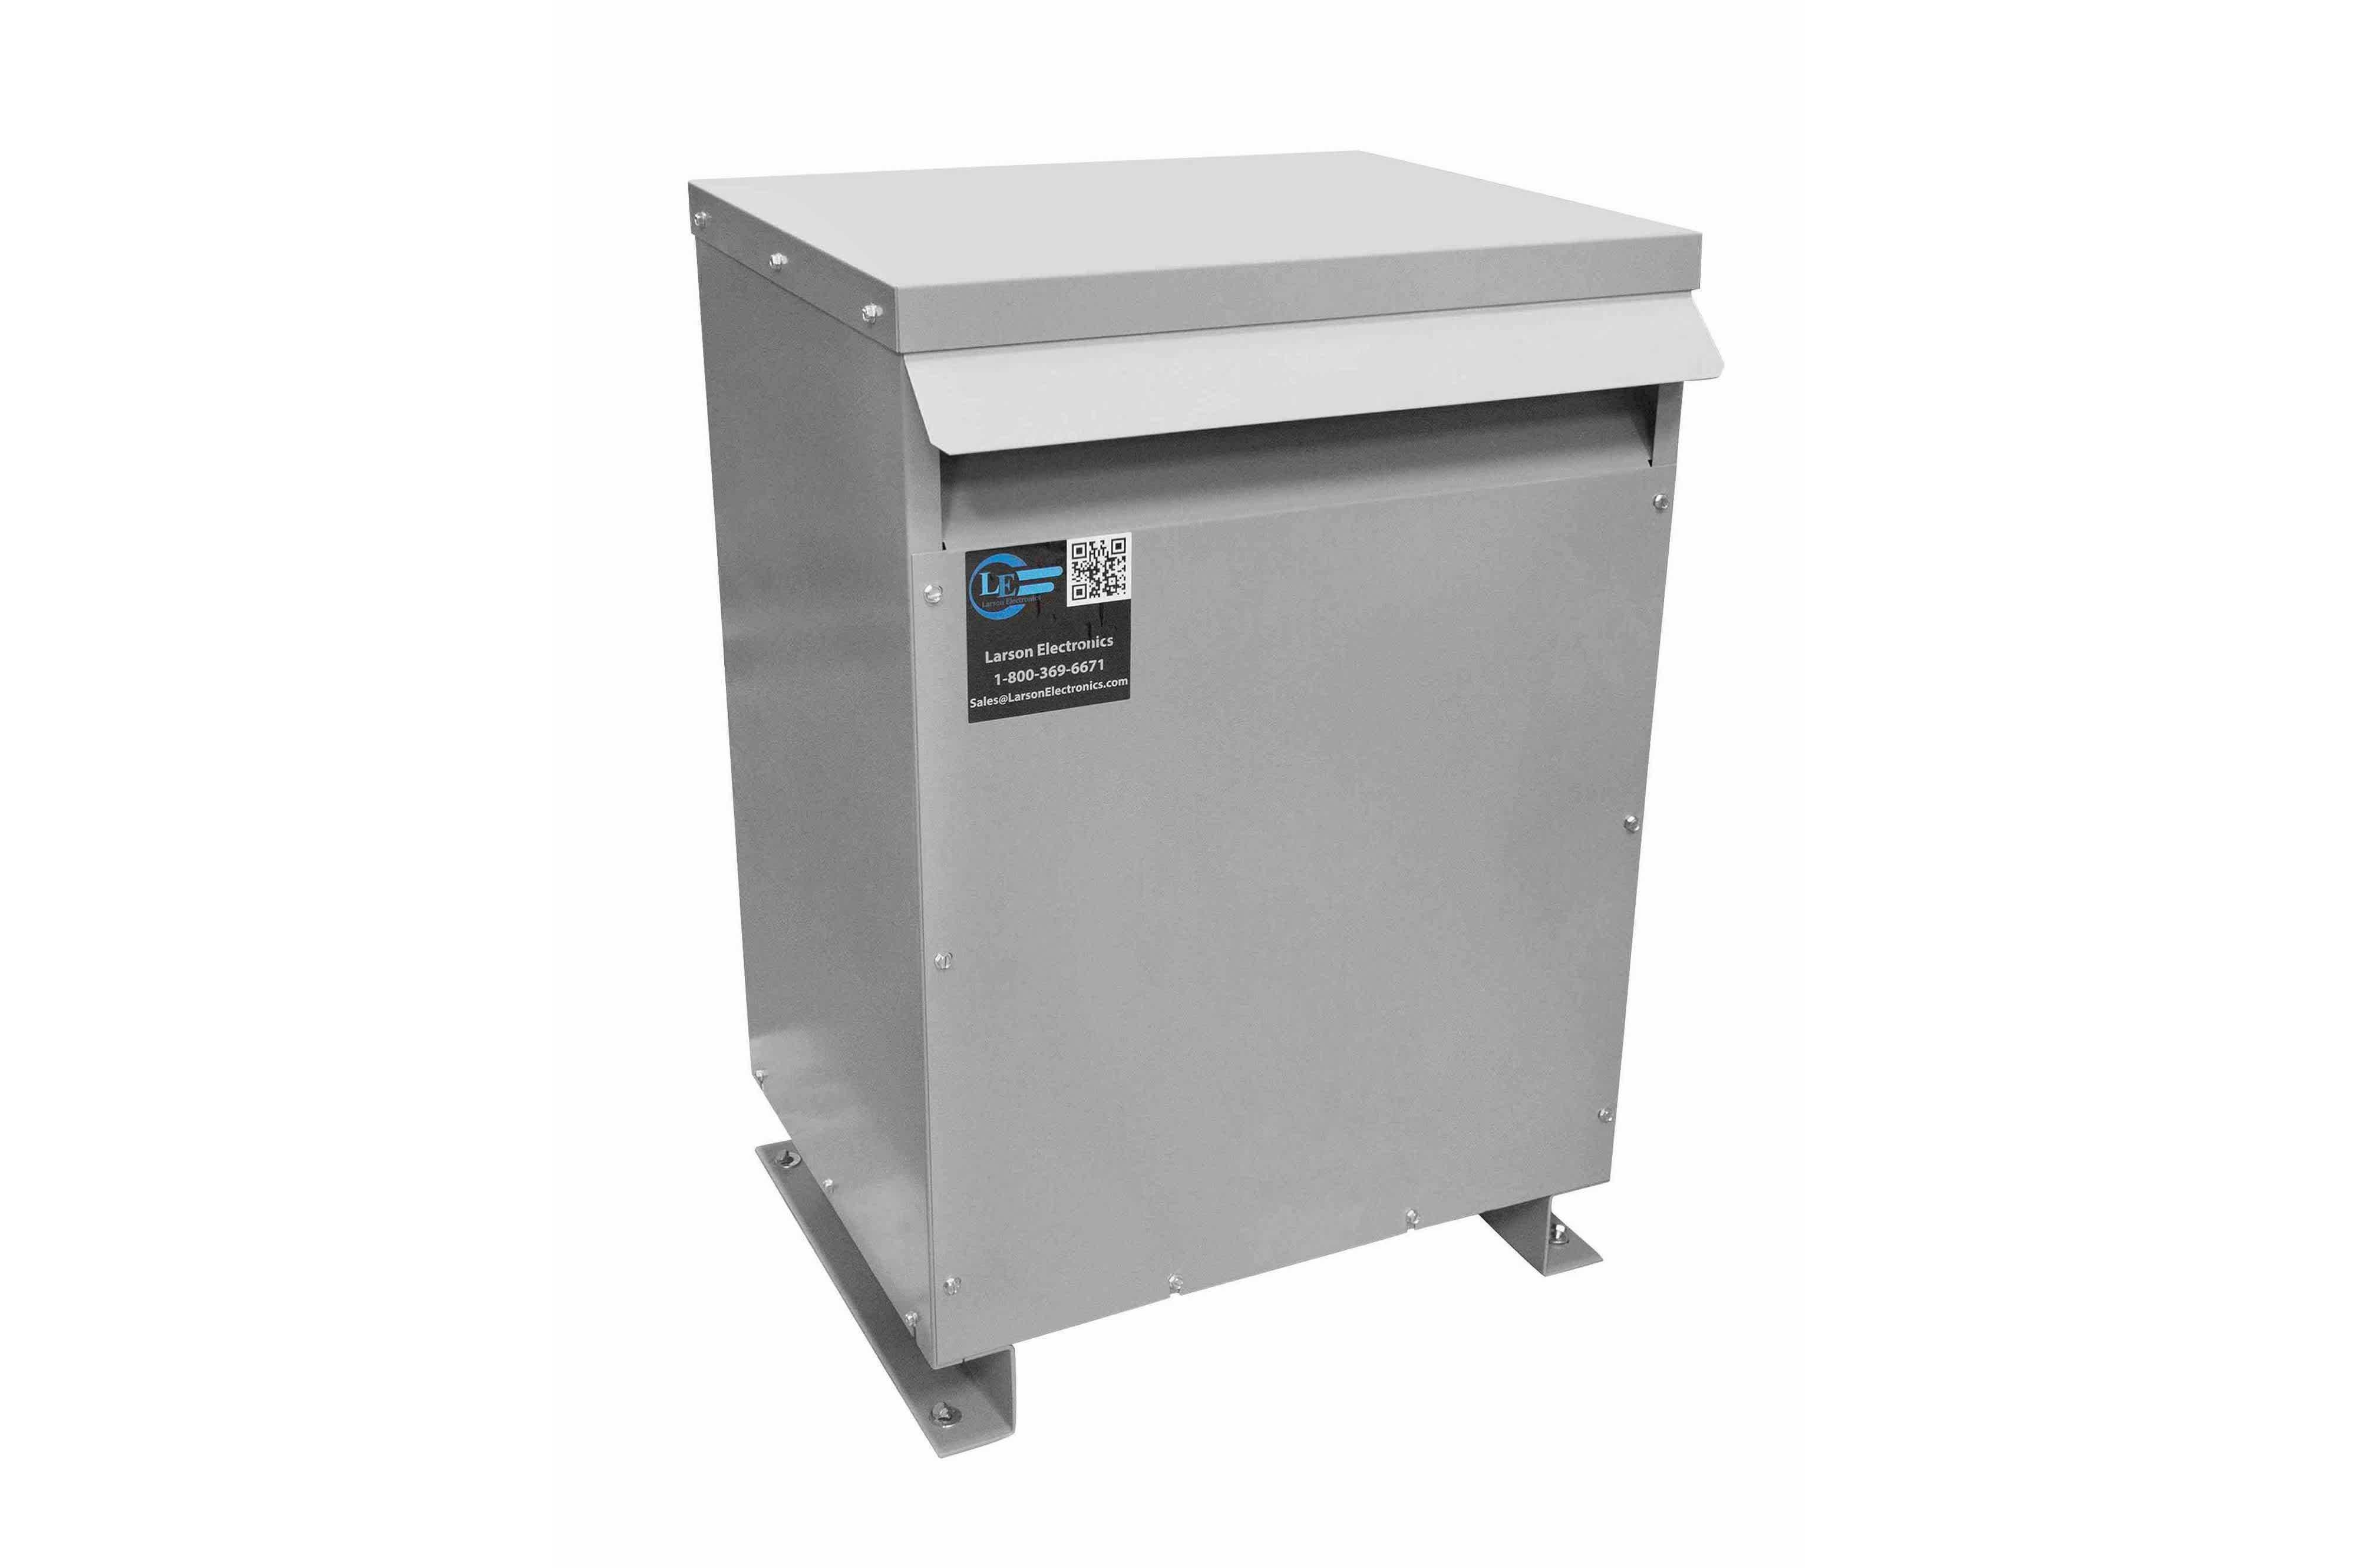 137.5 kVA 3PH Isolation Transformer, 600V Wye Primary, 208V Delta Secondary, N3R, Ventilated, 60 Hz